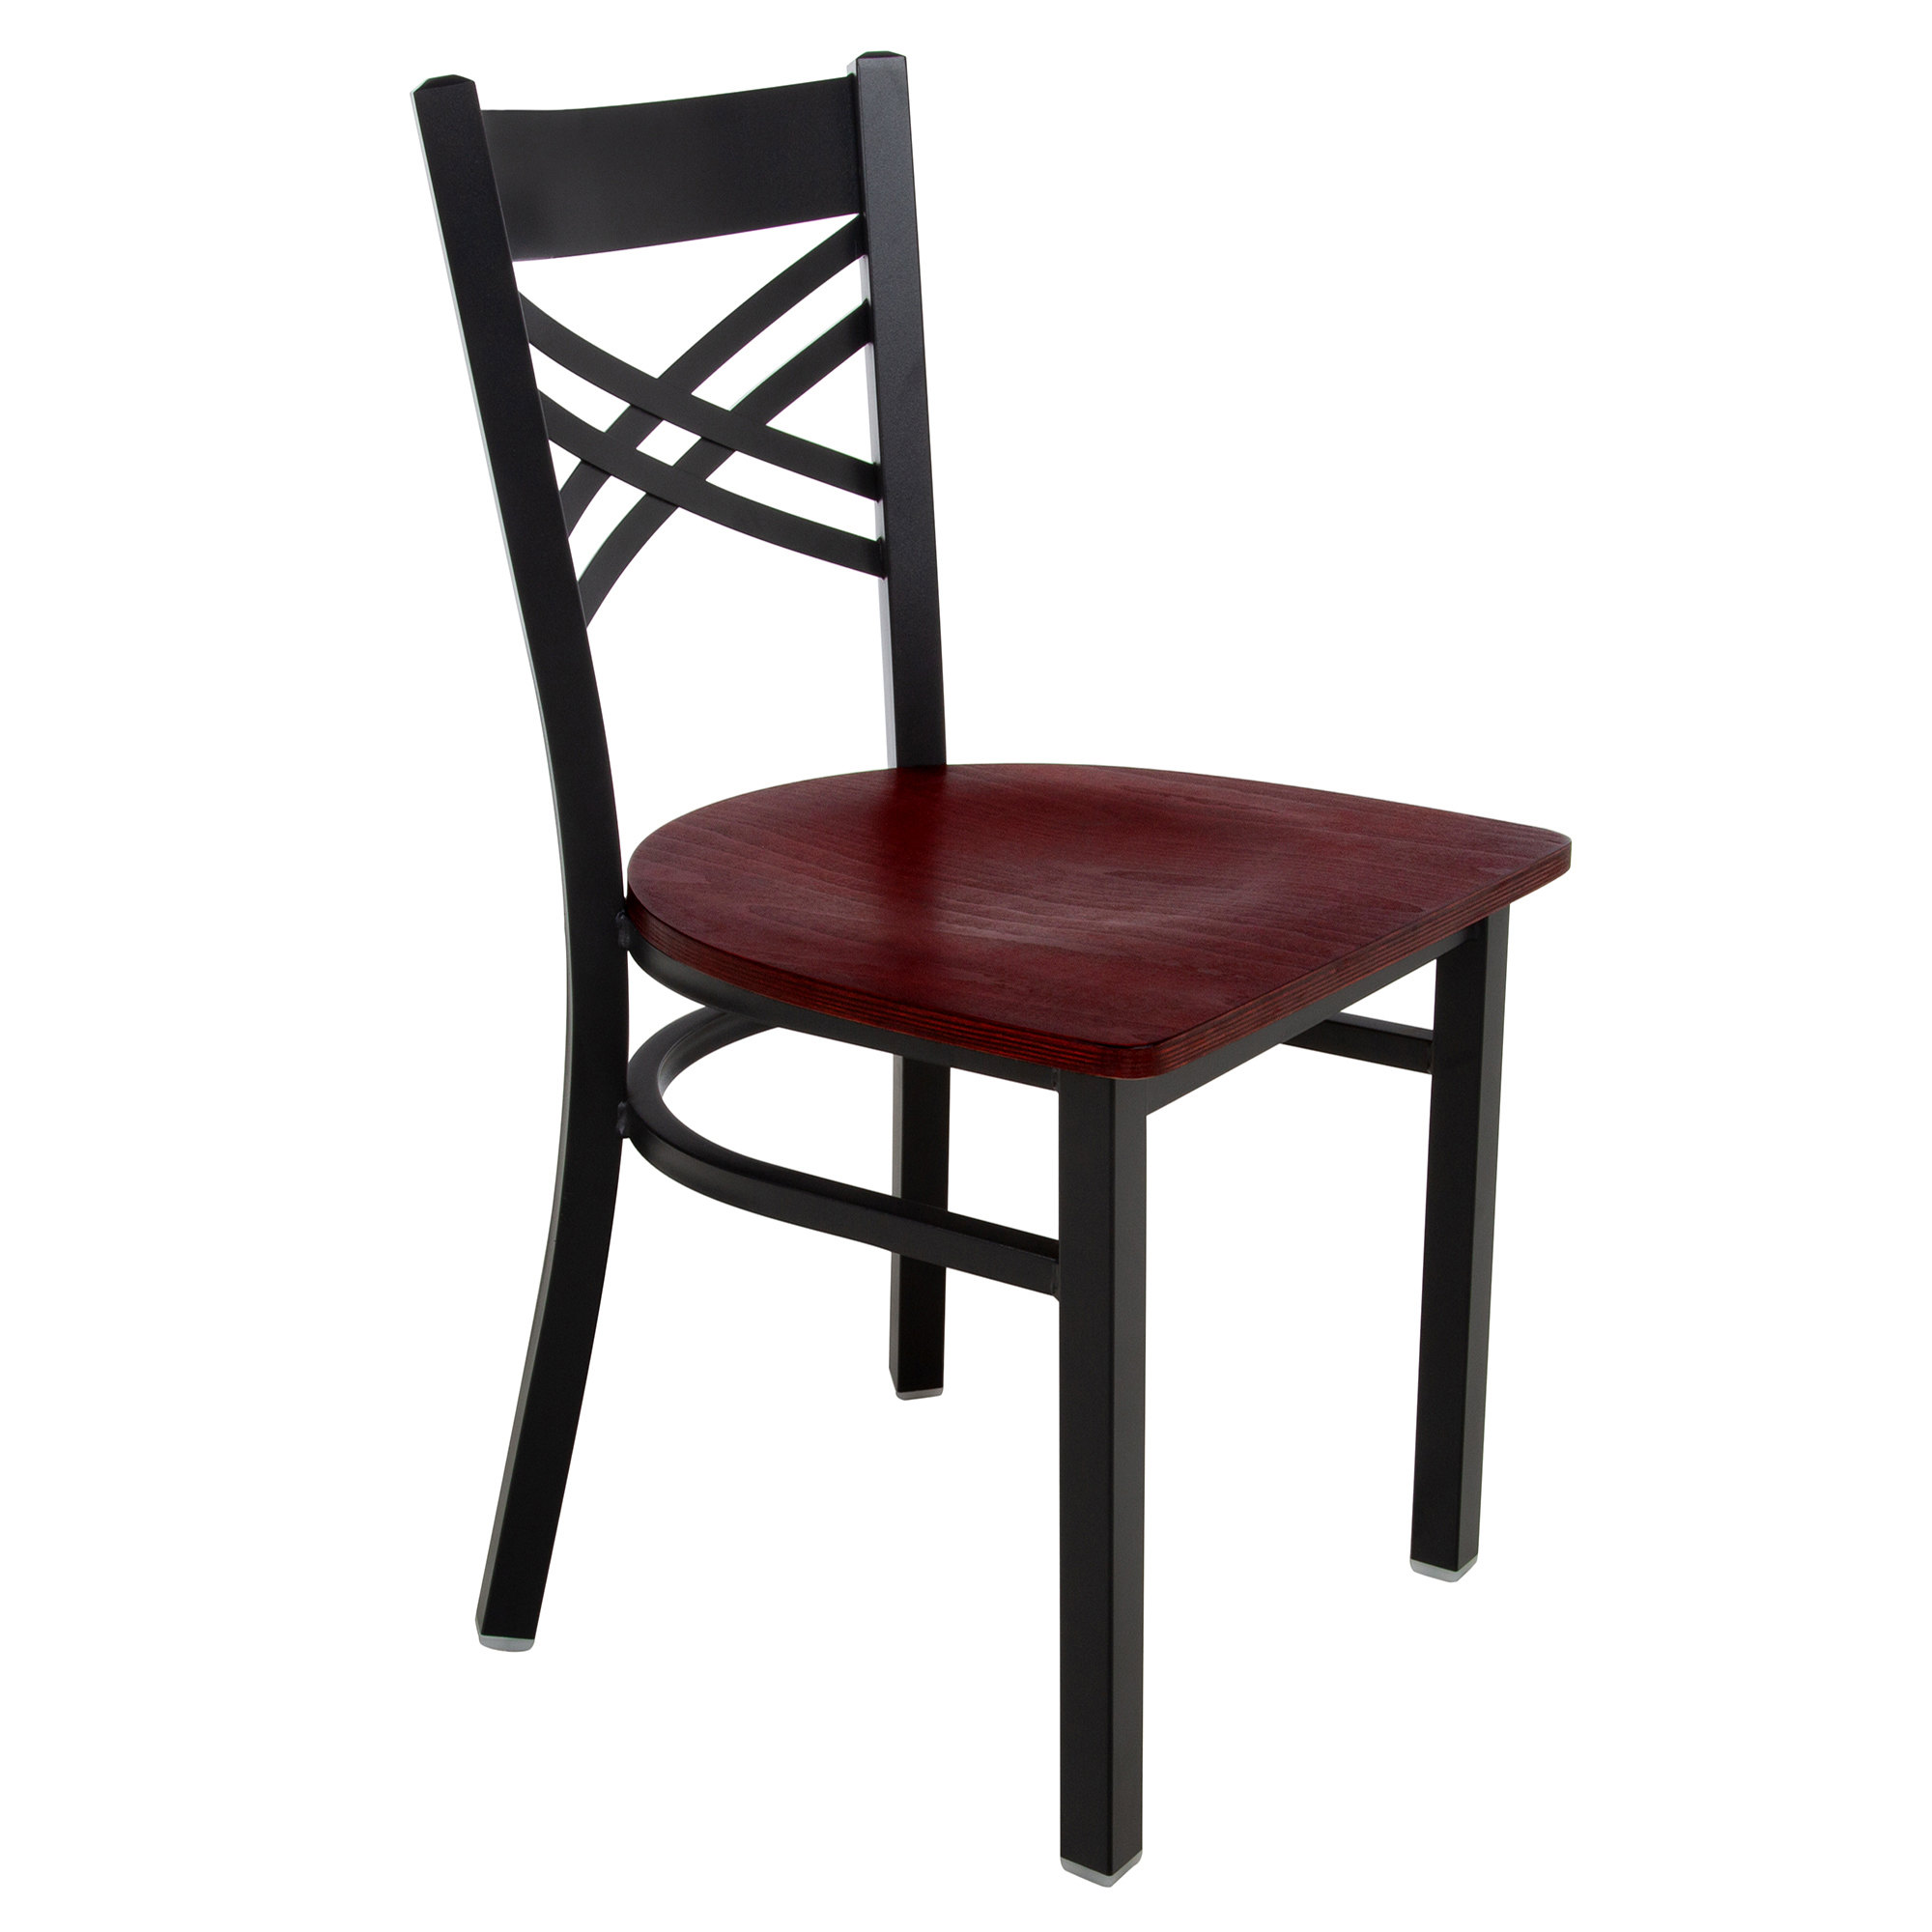 #155 - Black Cross Back Design Restaurant Metal Chair with Mahogany Wood Seat